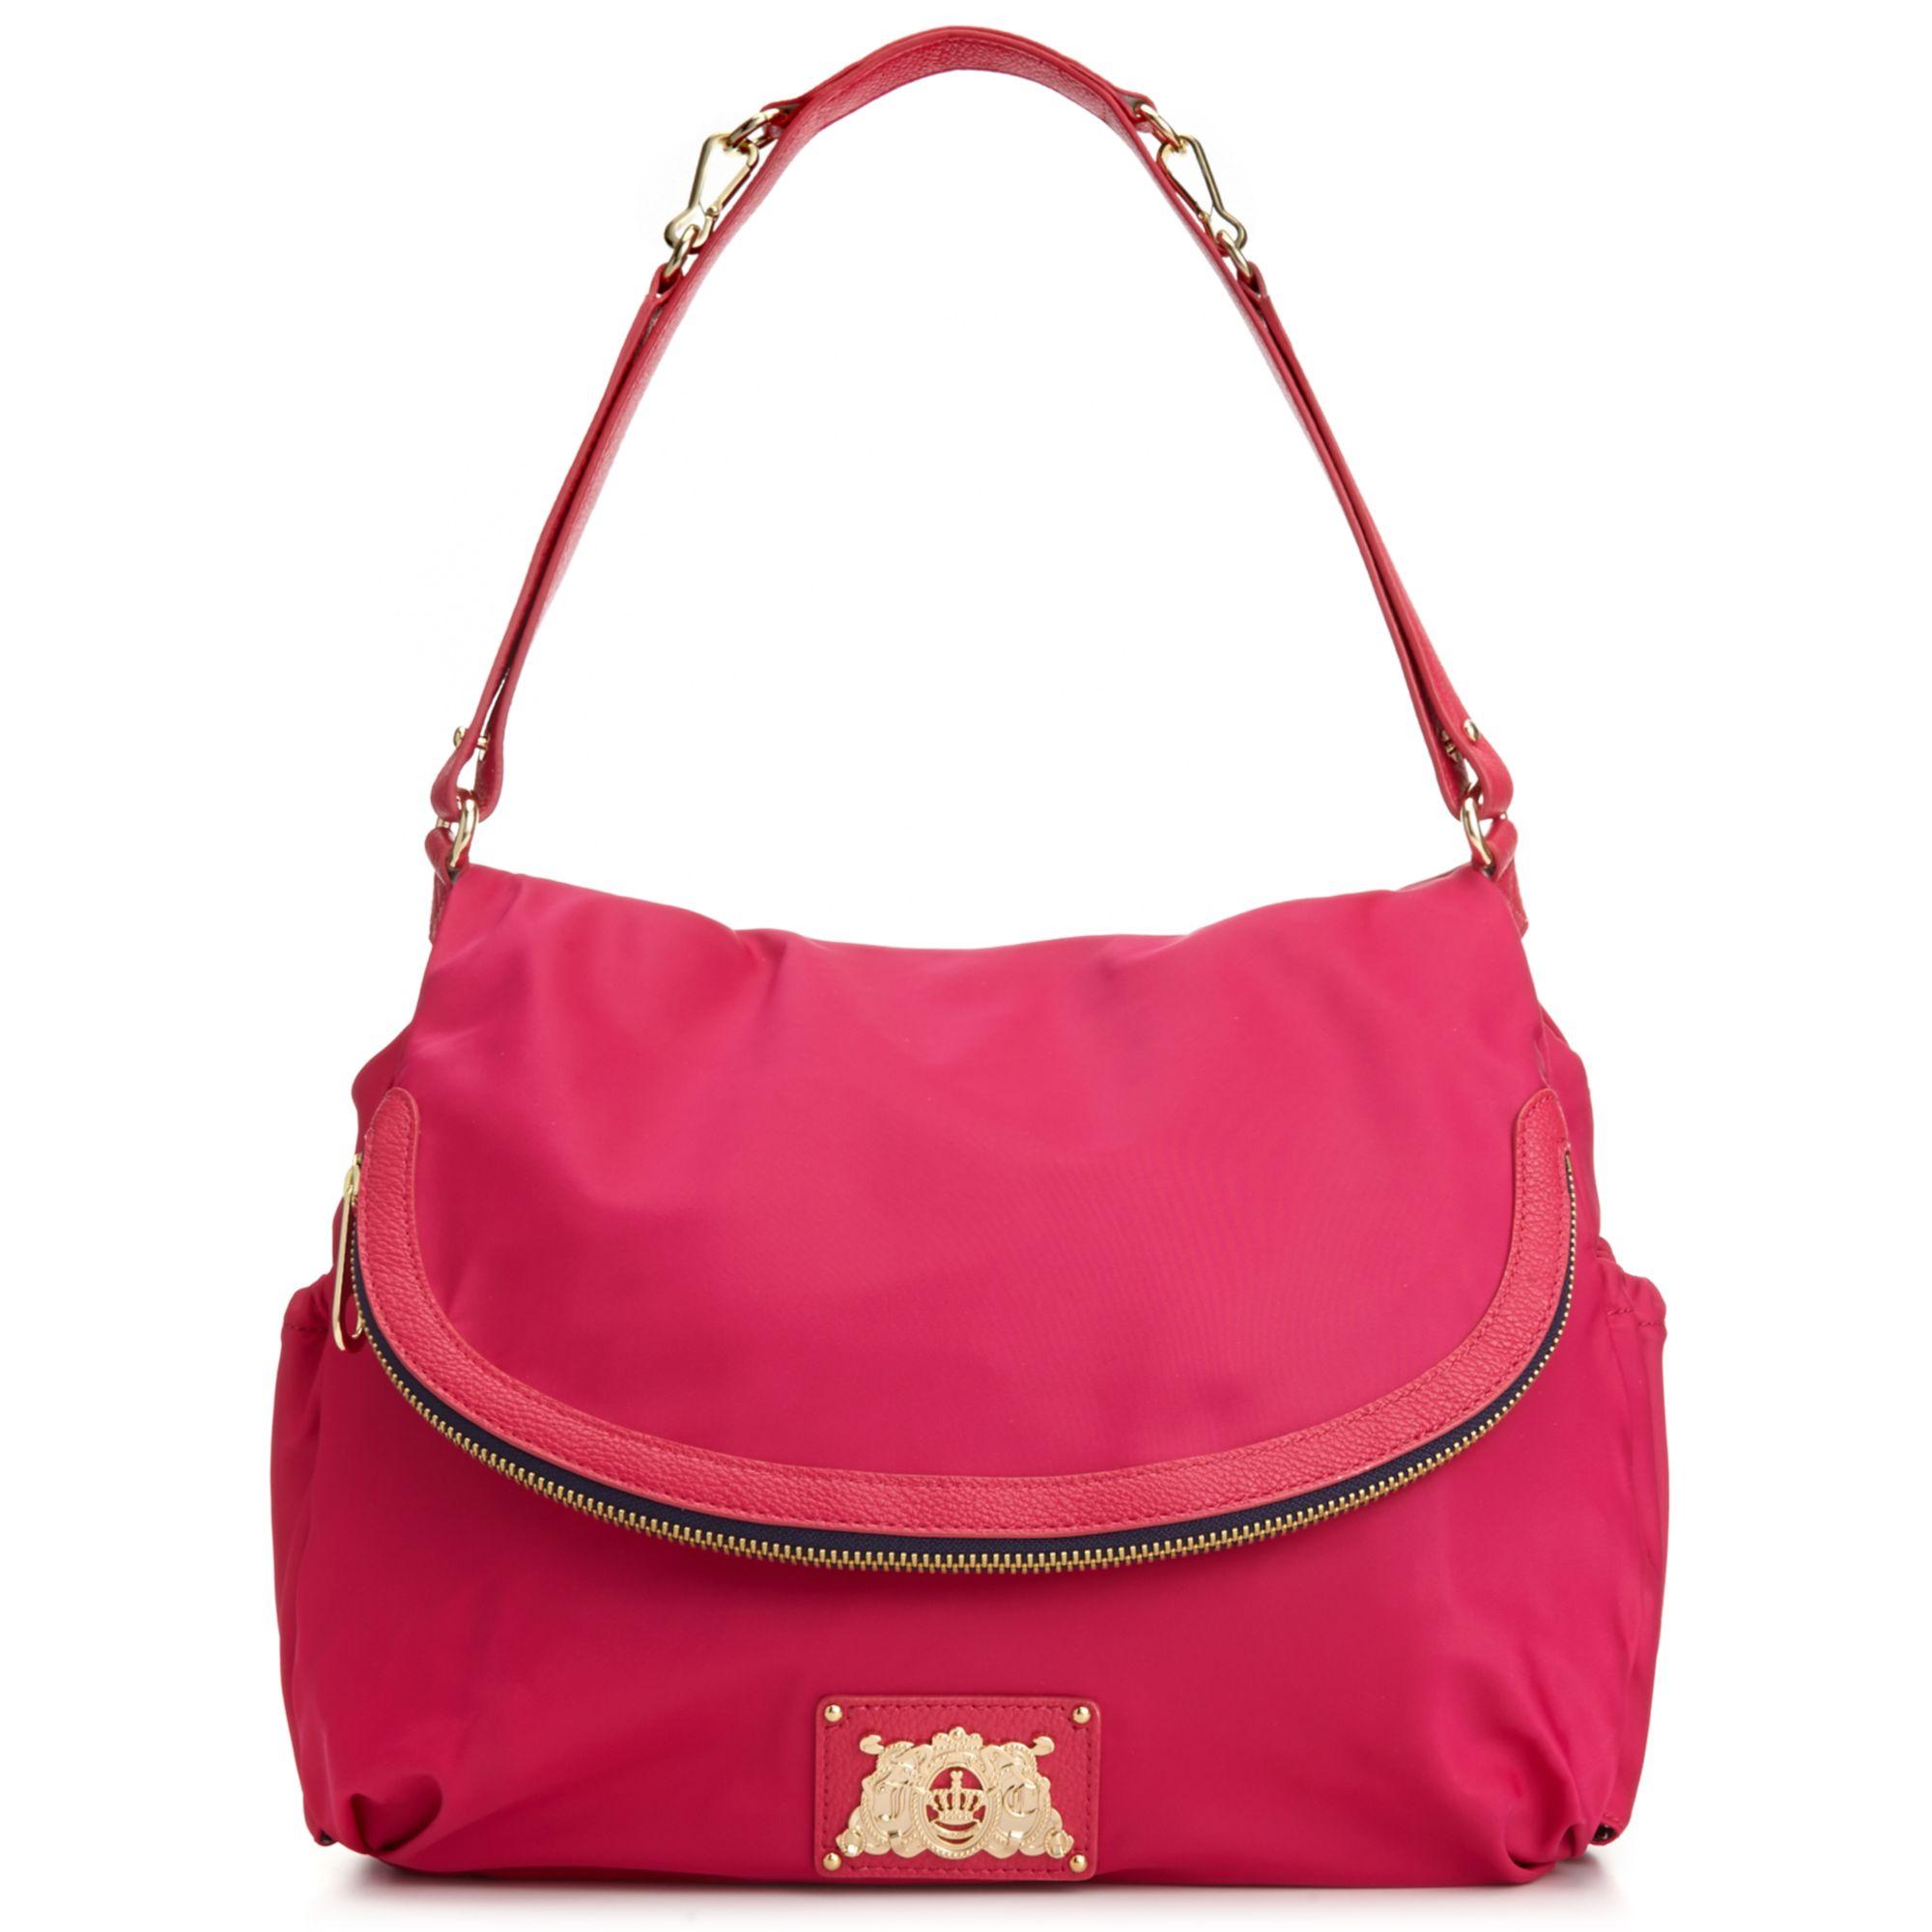 Lyst - Juicy Couture Malibu Nylon Crossbody Baby Bag in Pink 2f84b4fd9e